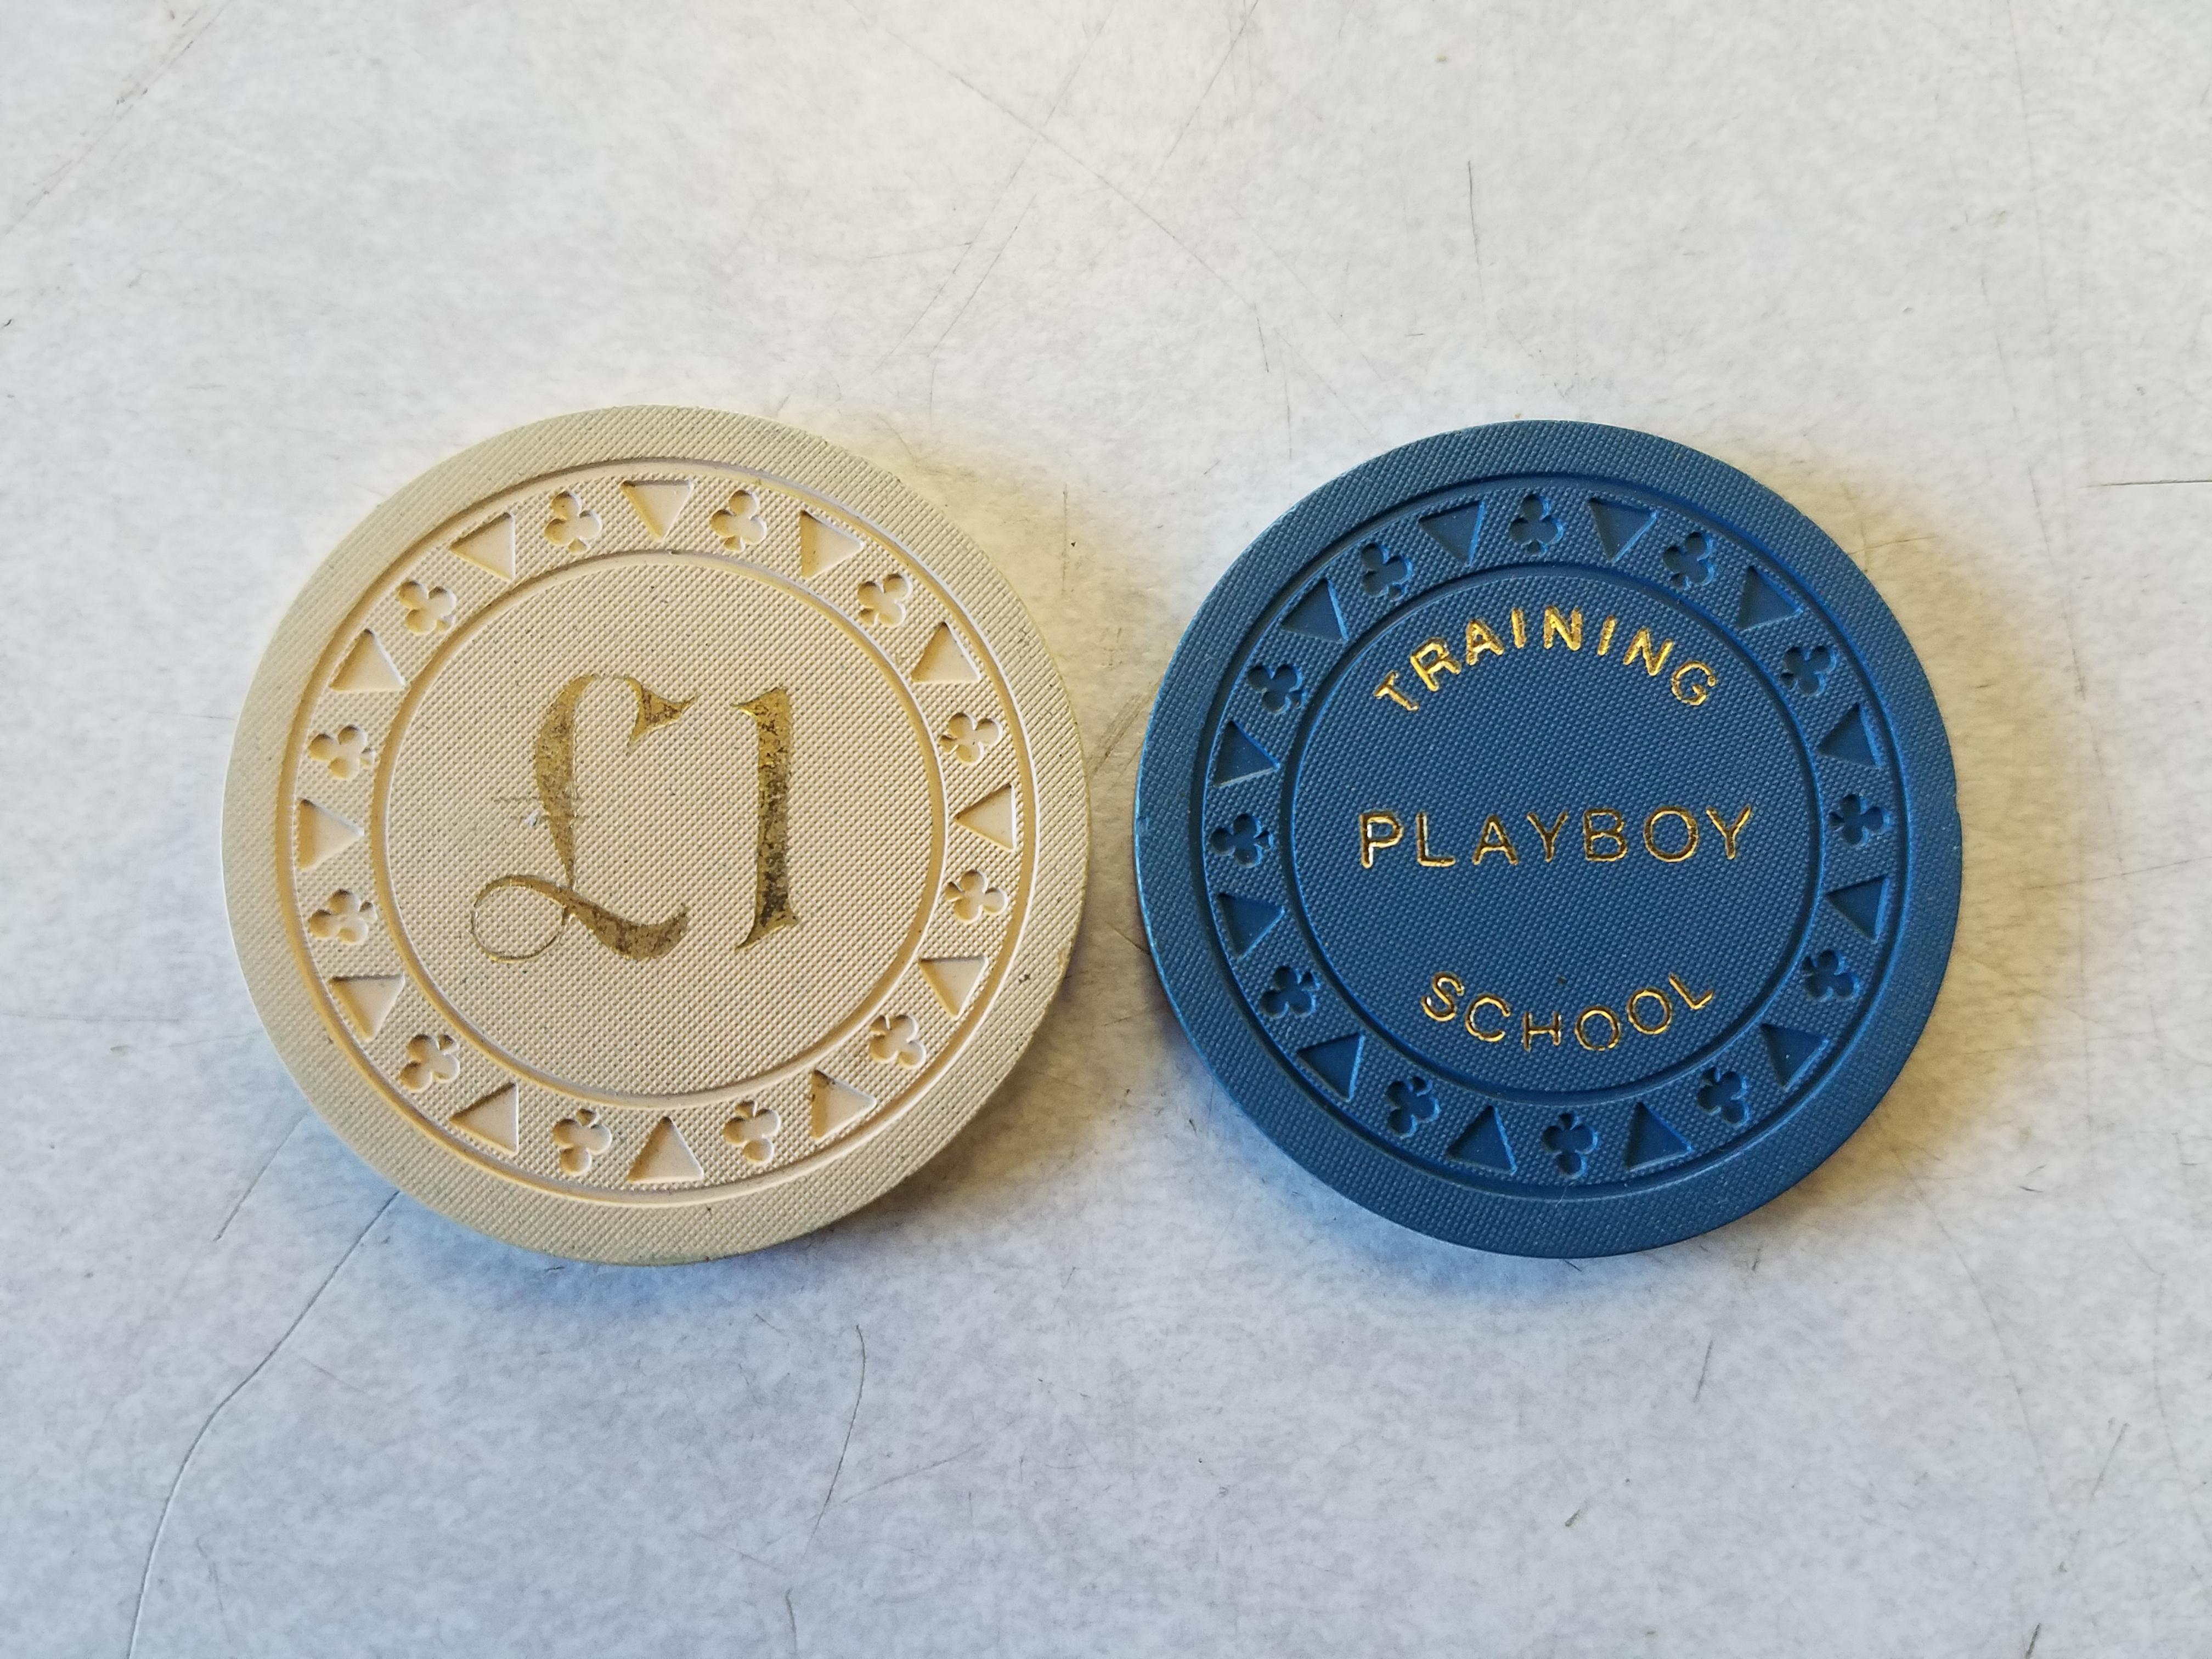 London Playboy Club Casino triclub training